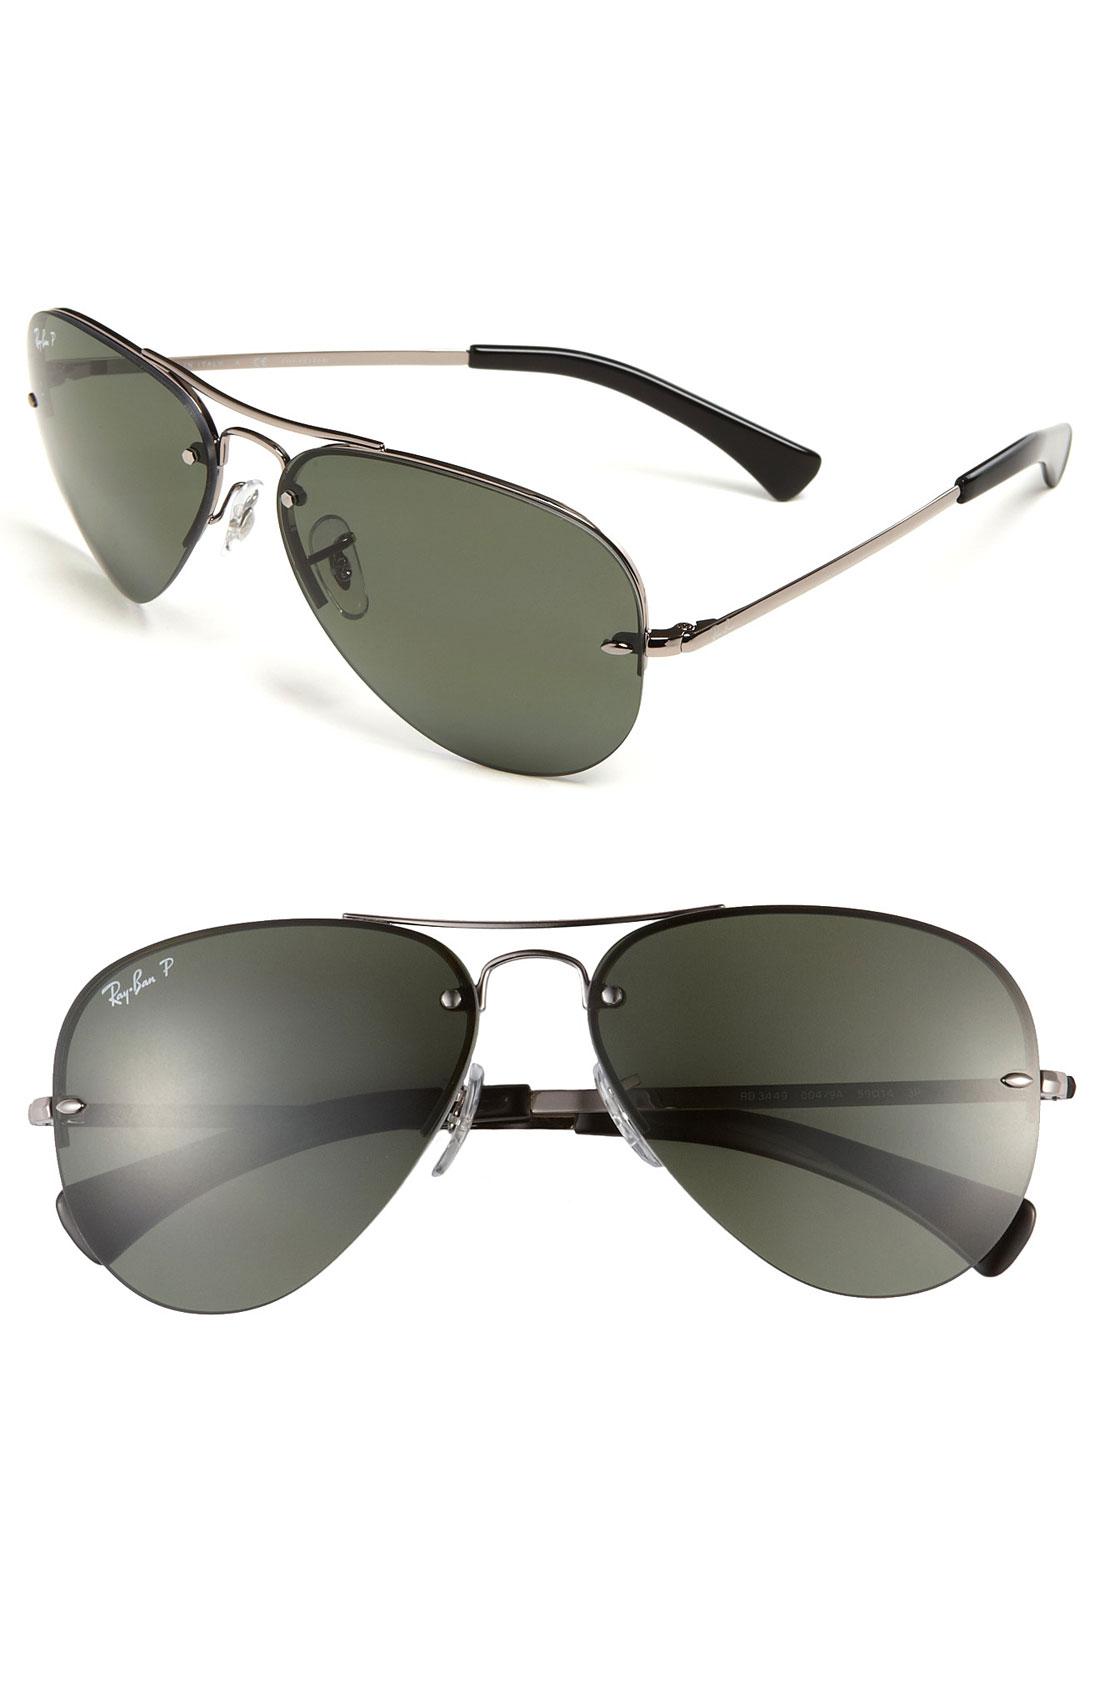 Rimless Aviator Sunglasses : Ray-ban Rimless Aviator Polarized 59mm Sunglasses in ...